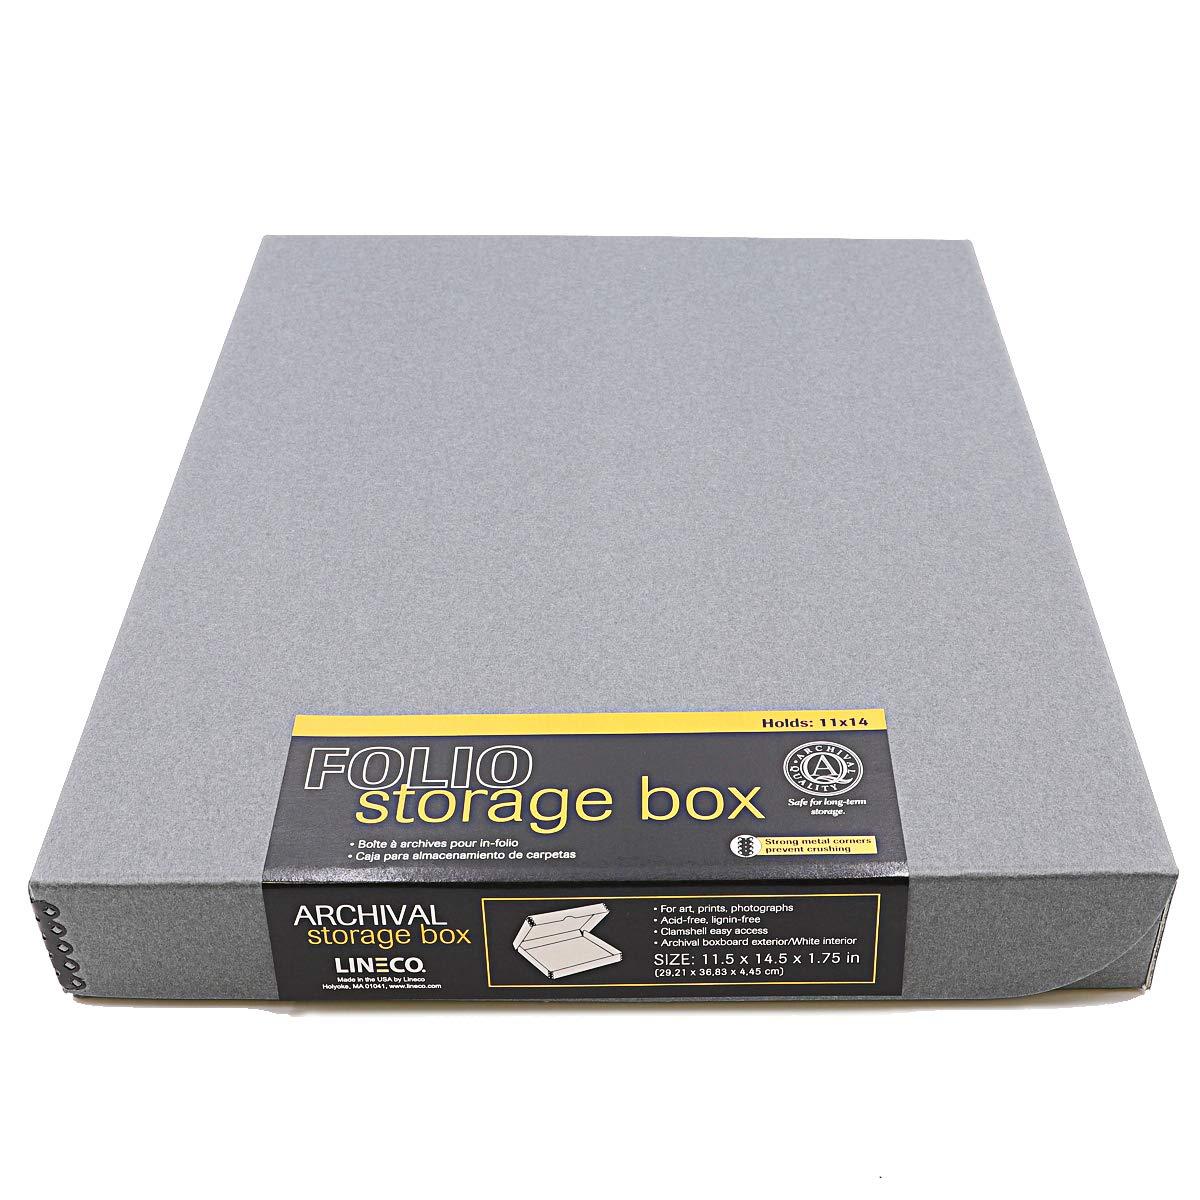 Lineco Archival Folio Storage Boxboard, Acid-Free with Metal Edges, 11.5 X 14.5 X 1.75 inches, Gray (717-2114) by Lineco